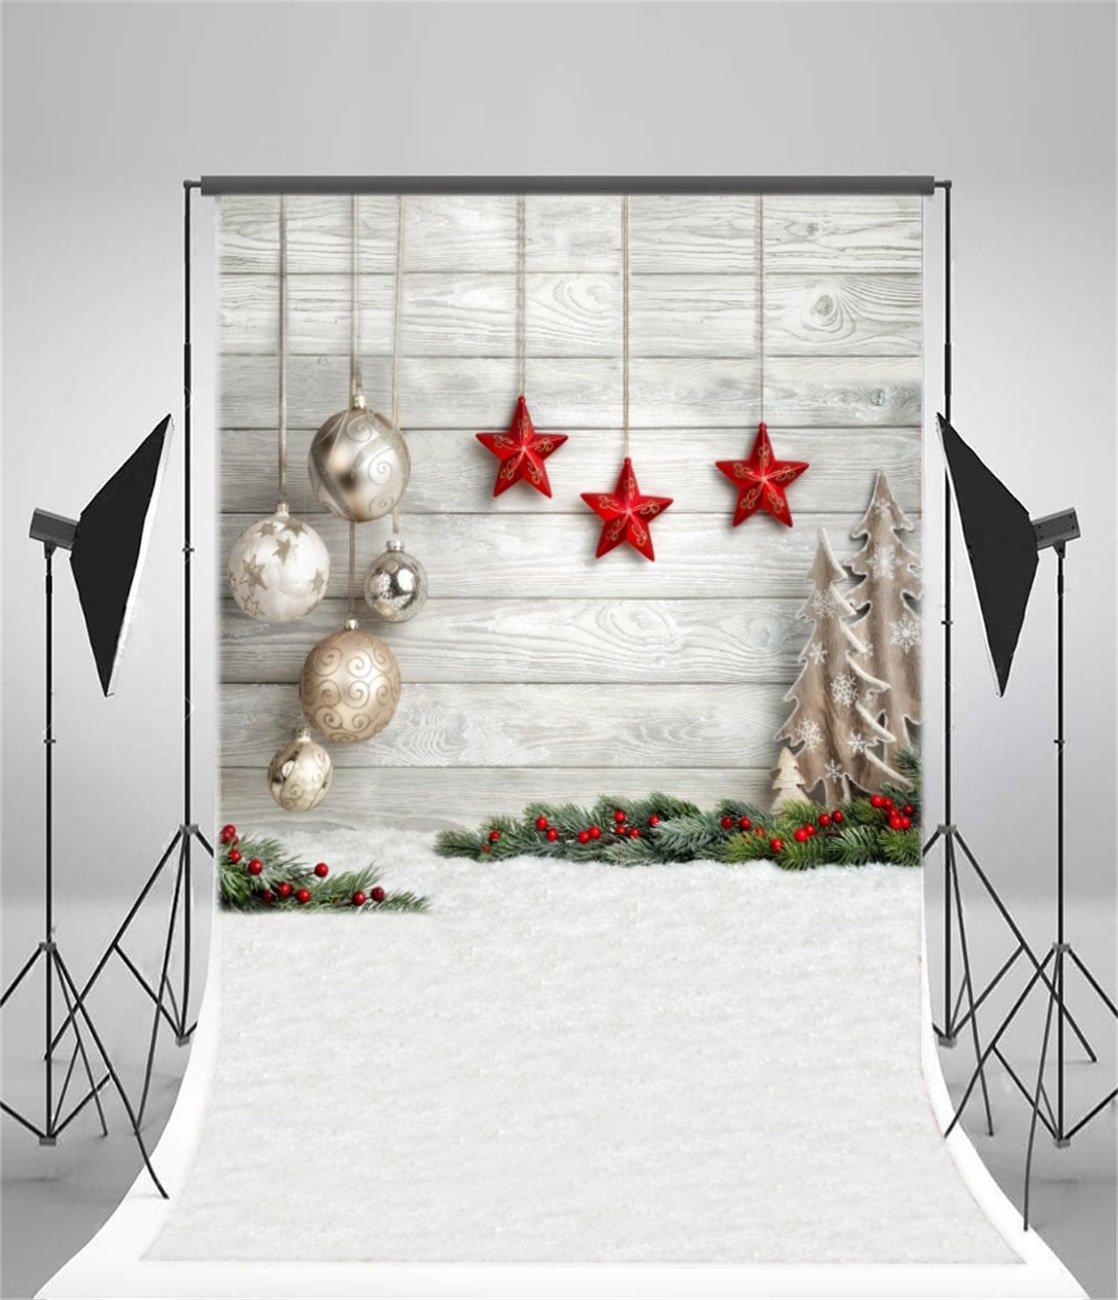 Amazon.com : AOFOTO 5x7ft Christmas Backdrop Xmas Tree Balls Star ...